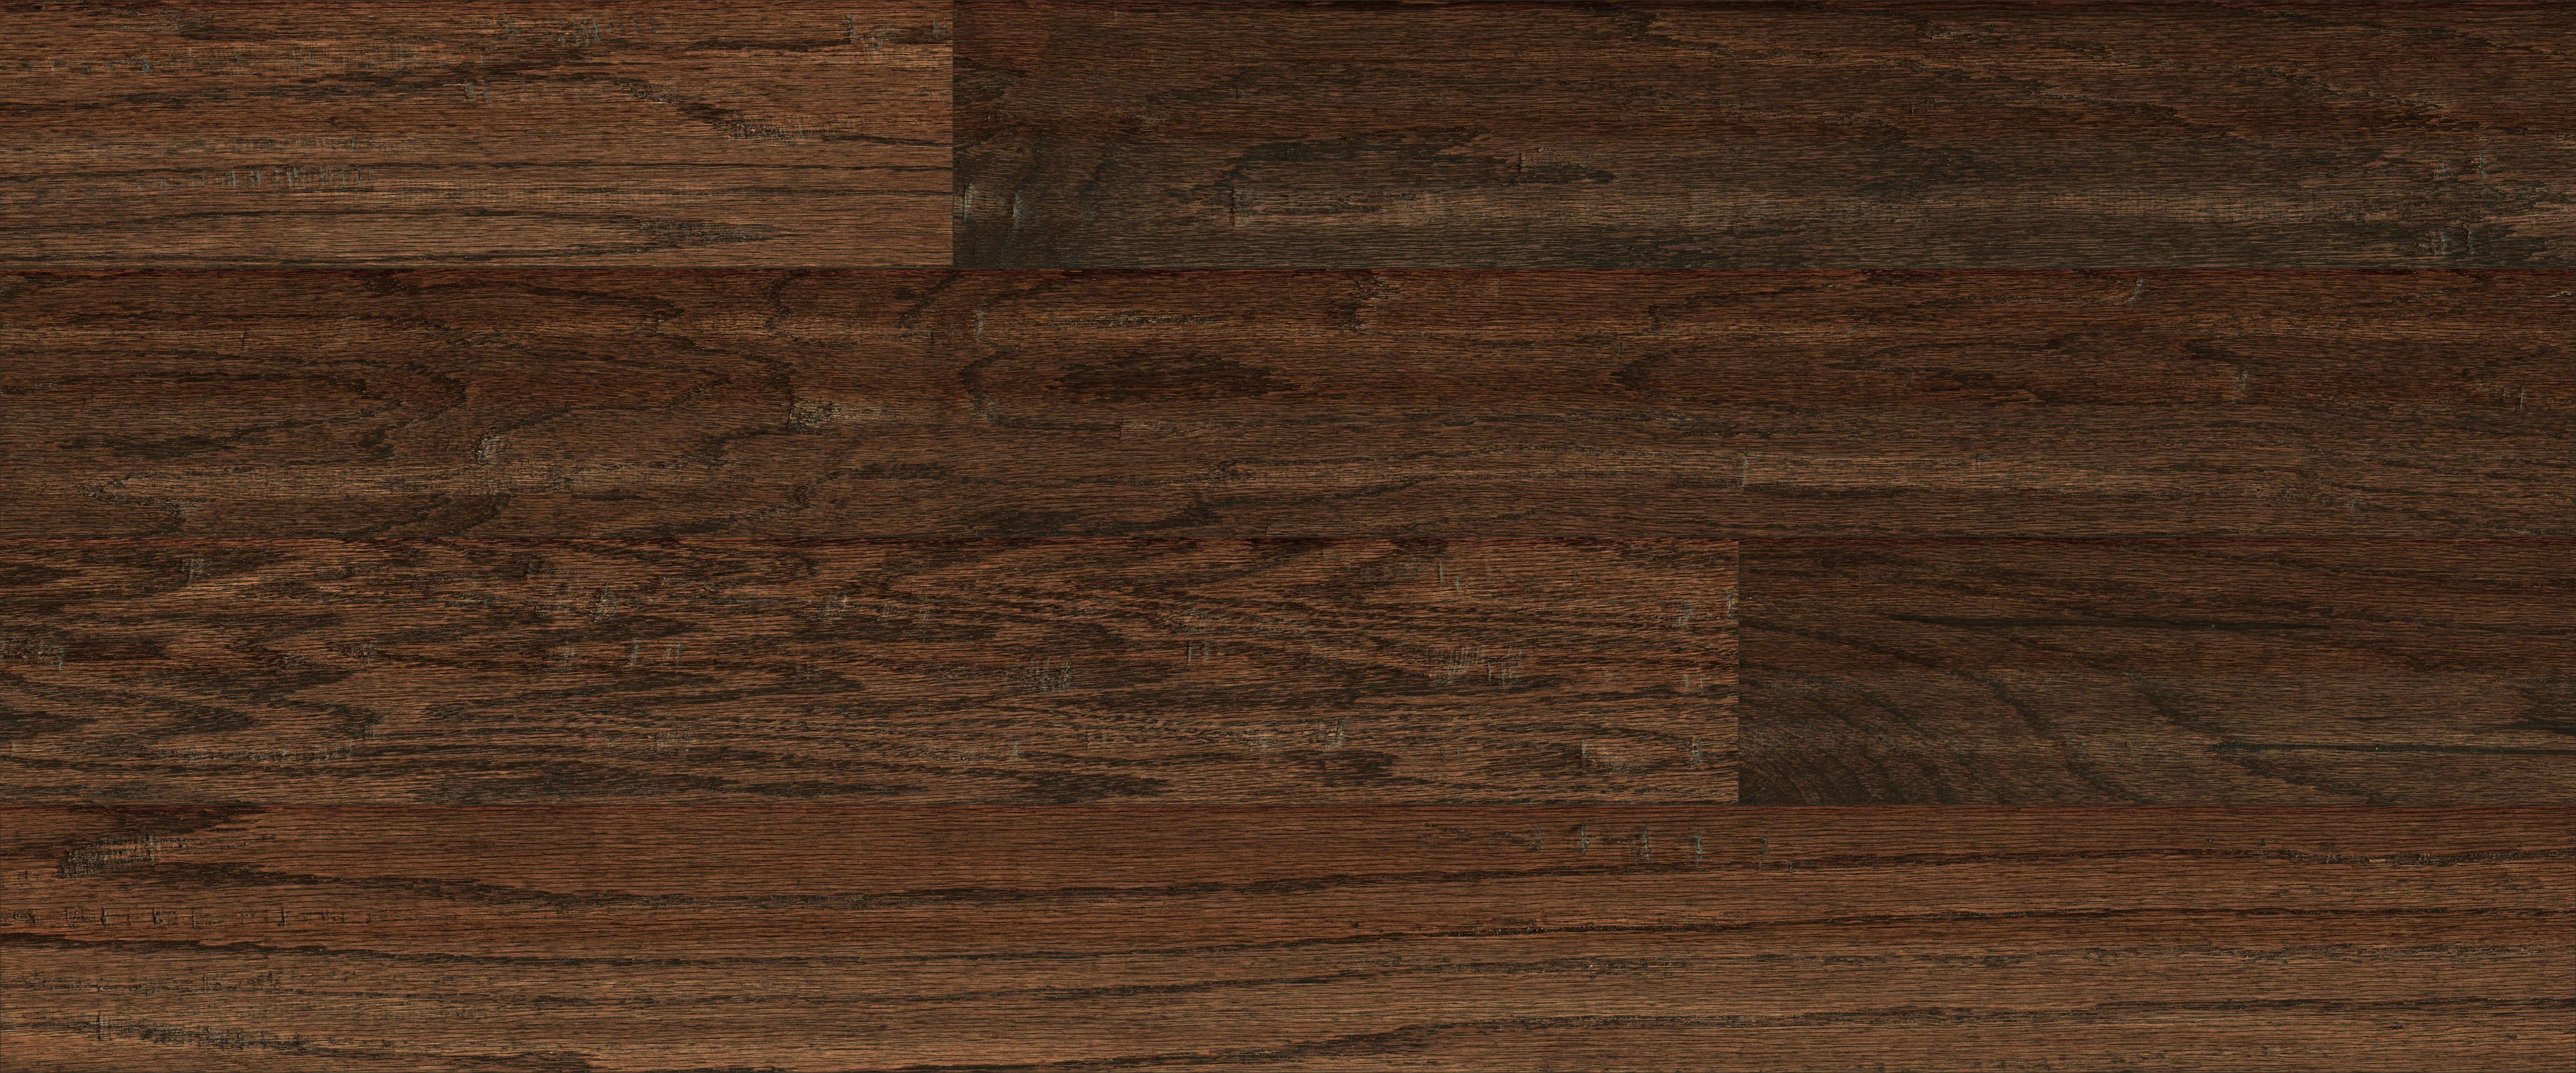 black hand scraped hardwood flooring of hand scraped hardwood flooring floor plan ideas pertaining to hand scraped hardwood flooring mullican lincolnshire sculpted red oak laredo 5 engineered hardwood